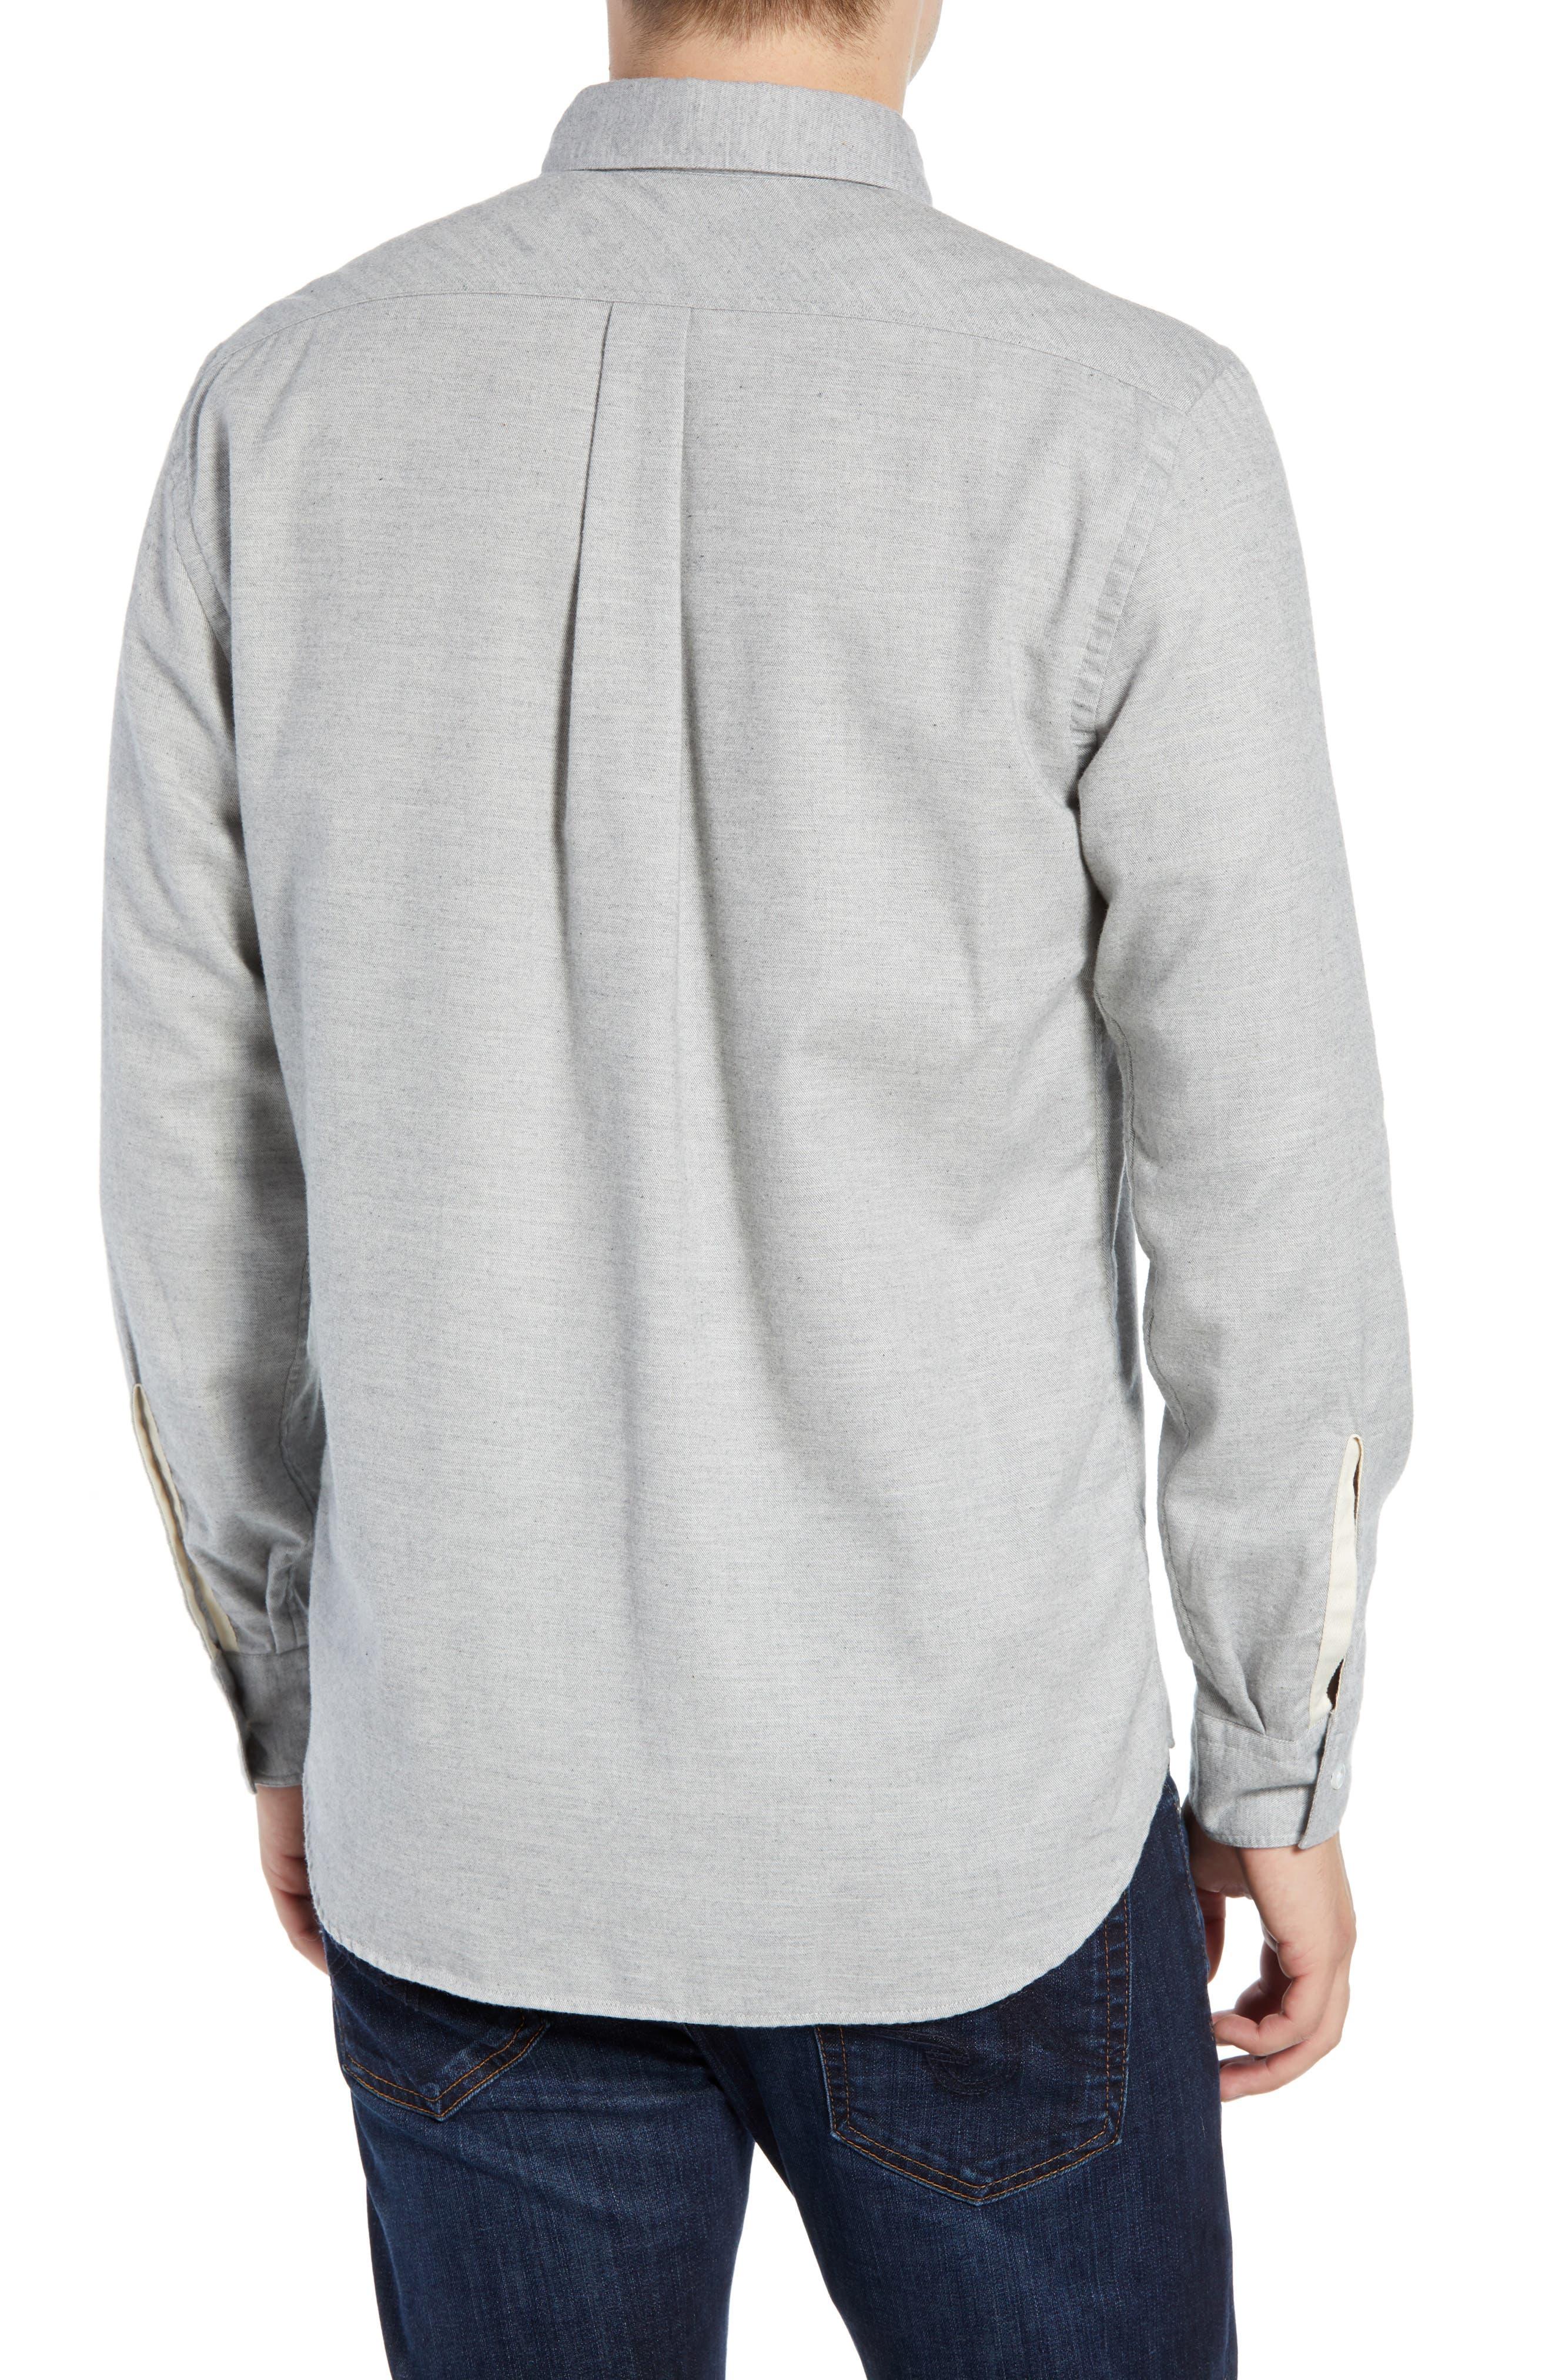 Tuscumbia Regular Fit Sport Shirt,                             Alternate thumbnail 3, color,                             LIGHT GREY